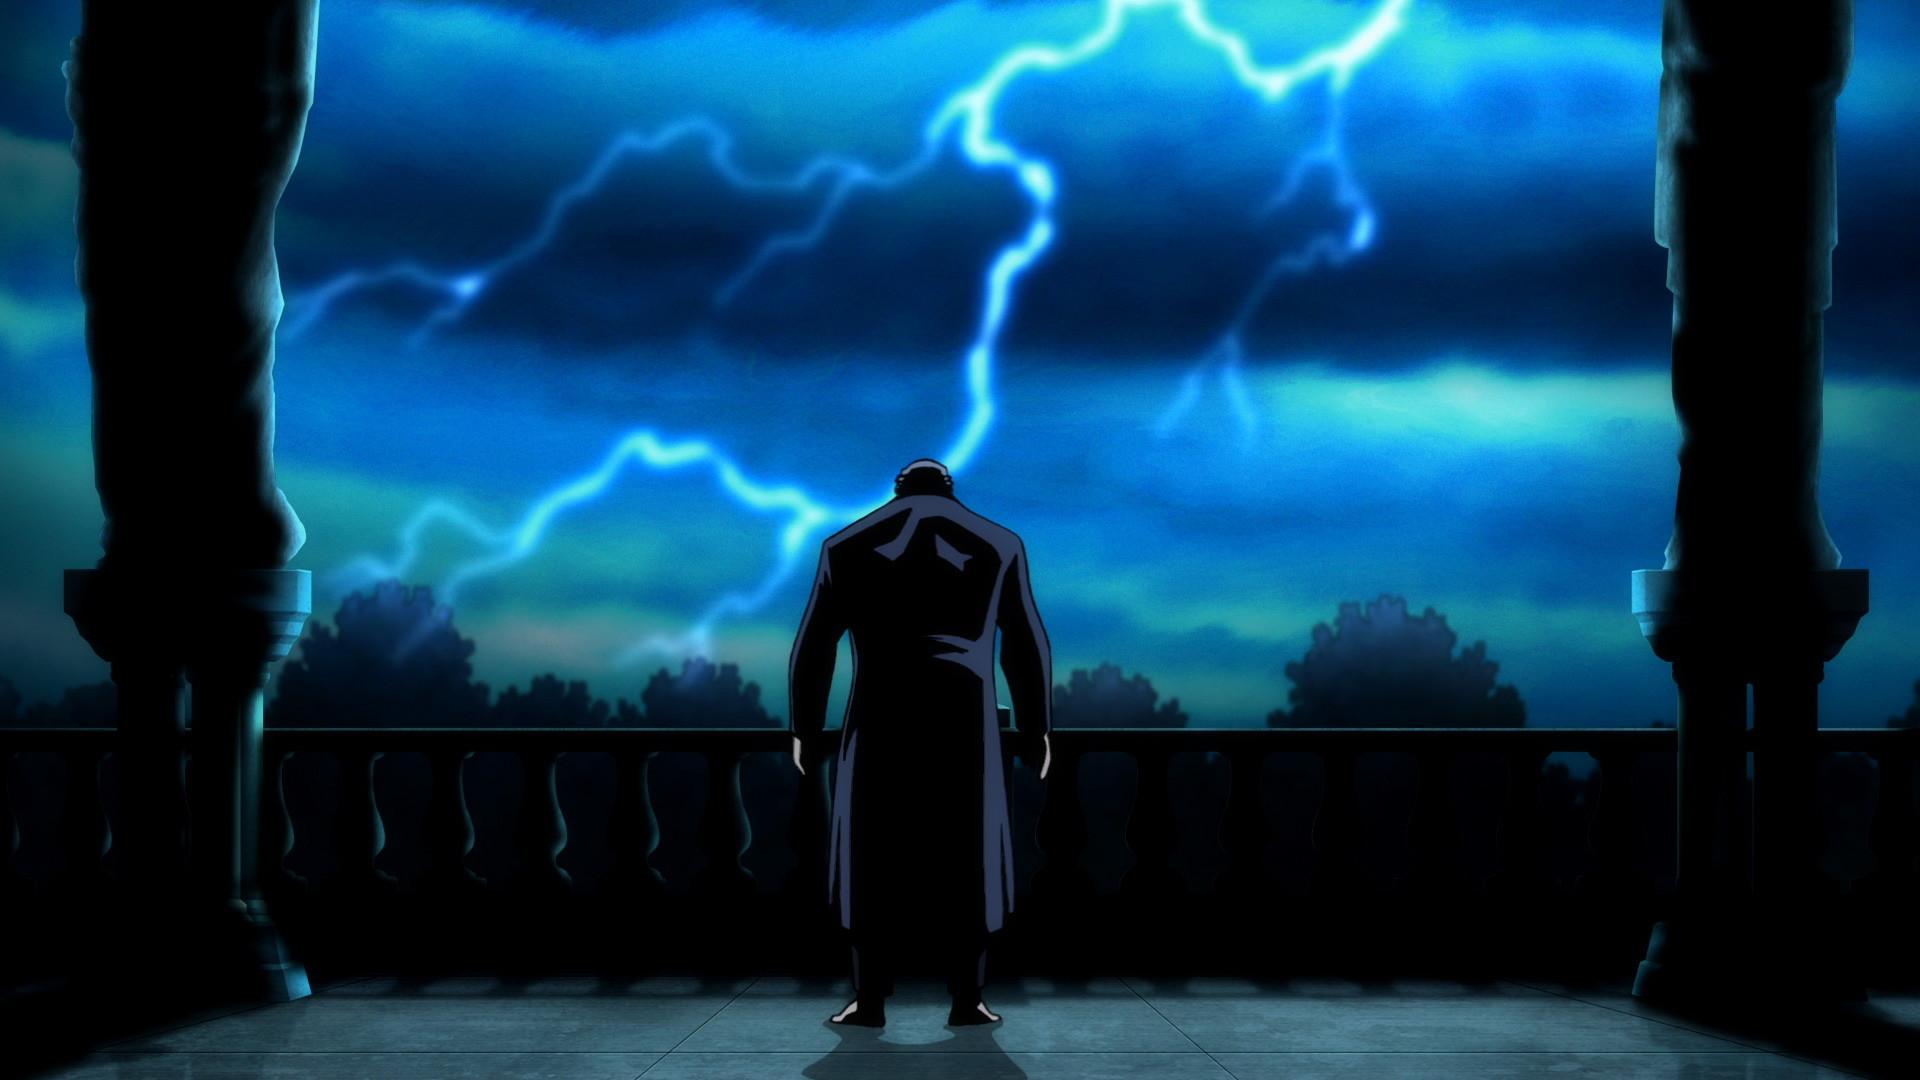 Bruce Wayne in BATMAN: THE DARK KNIGHT RETURNS, PART 1